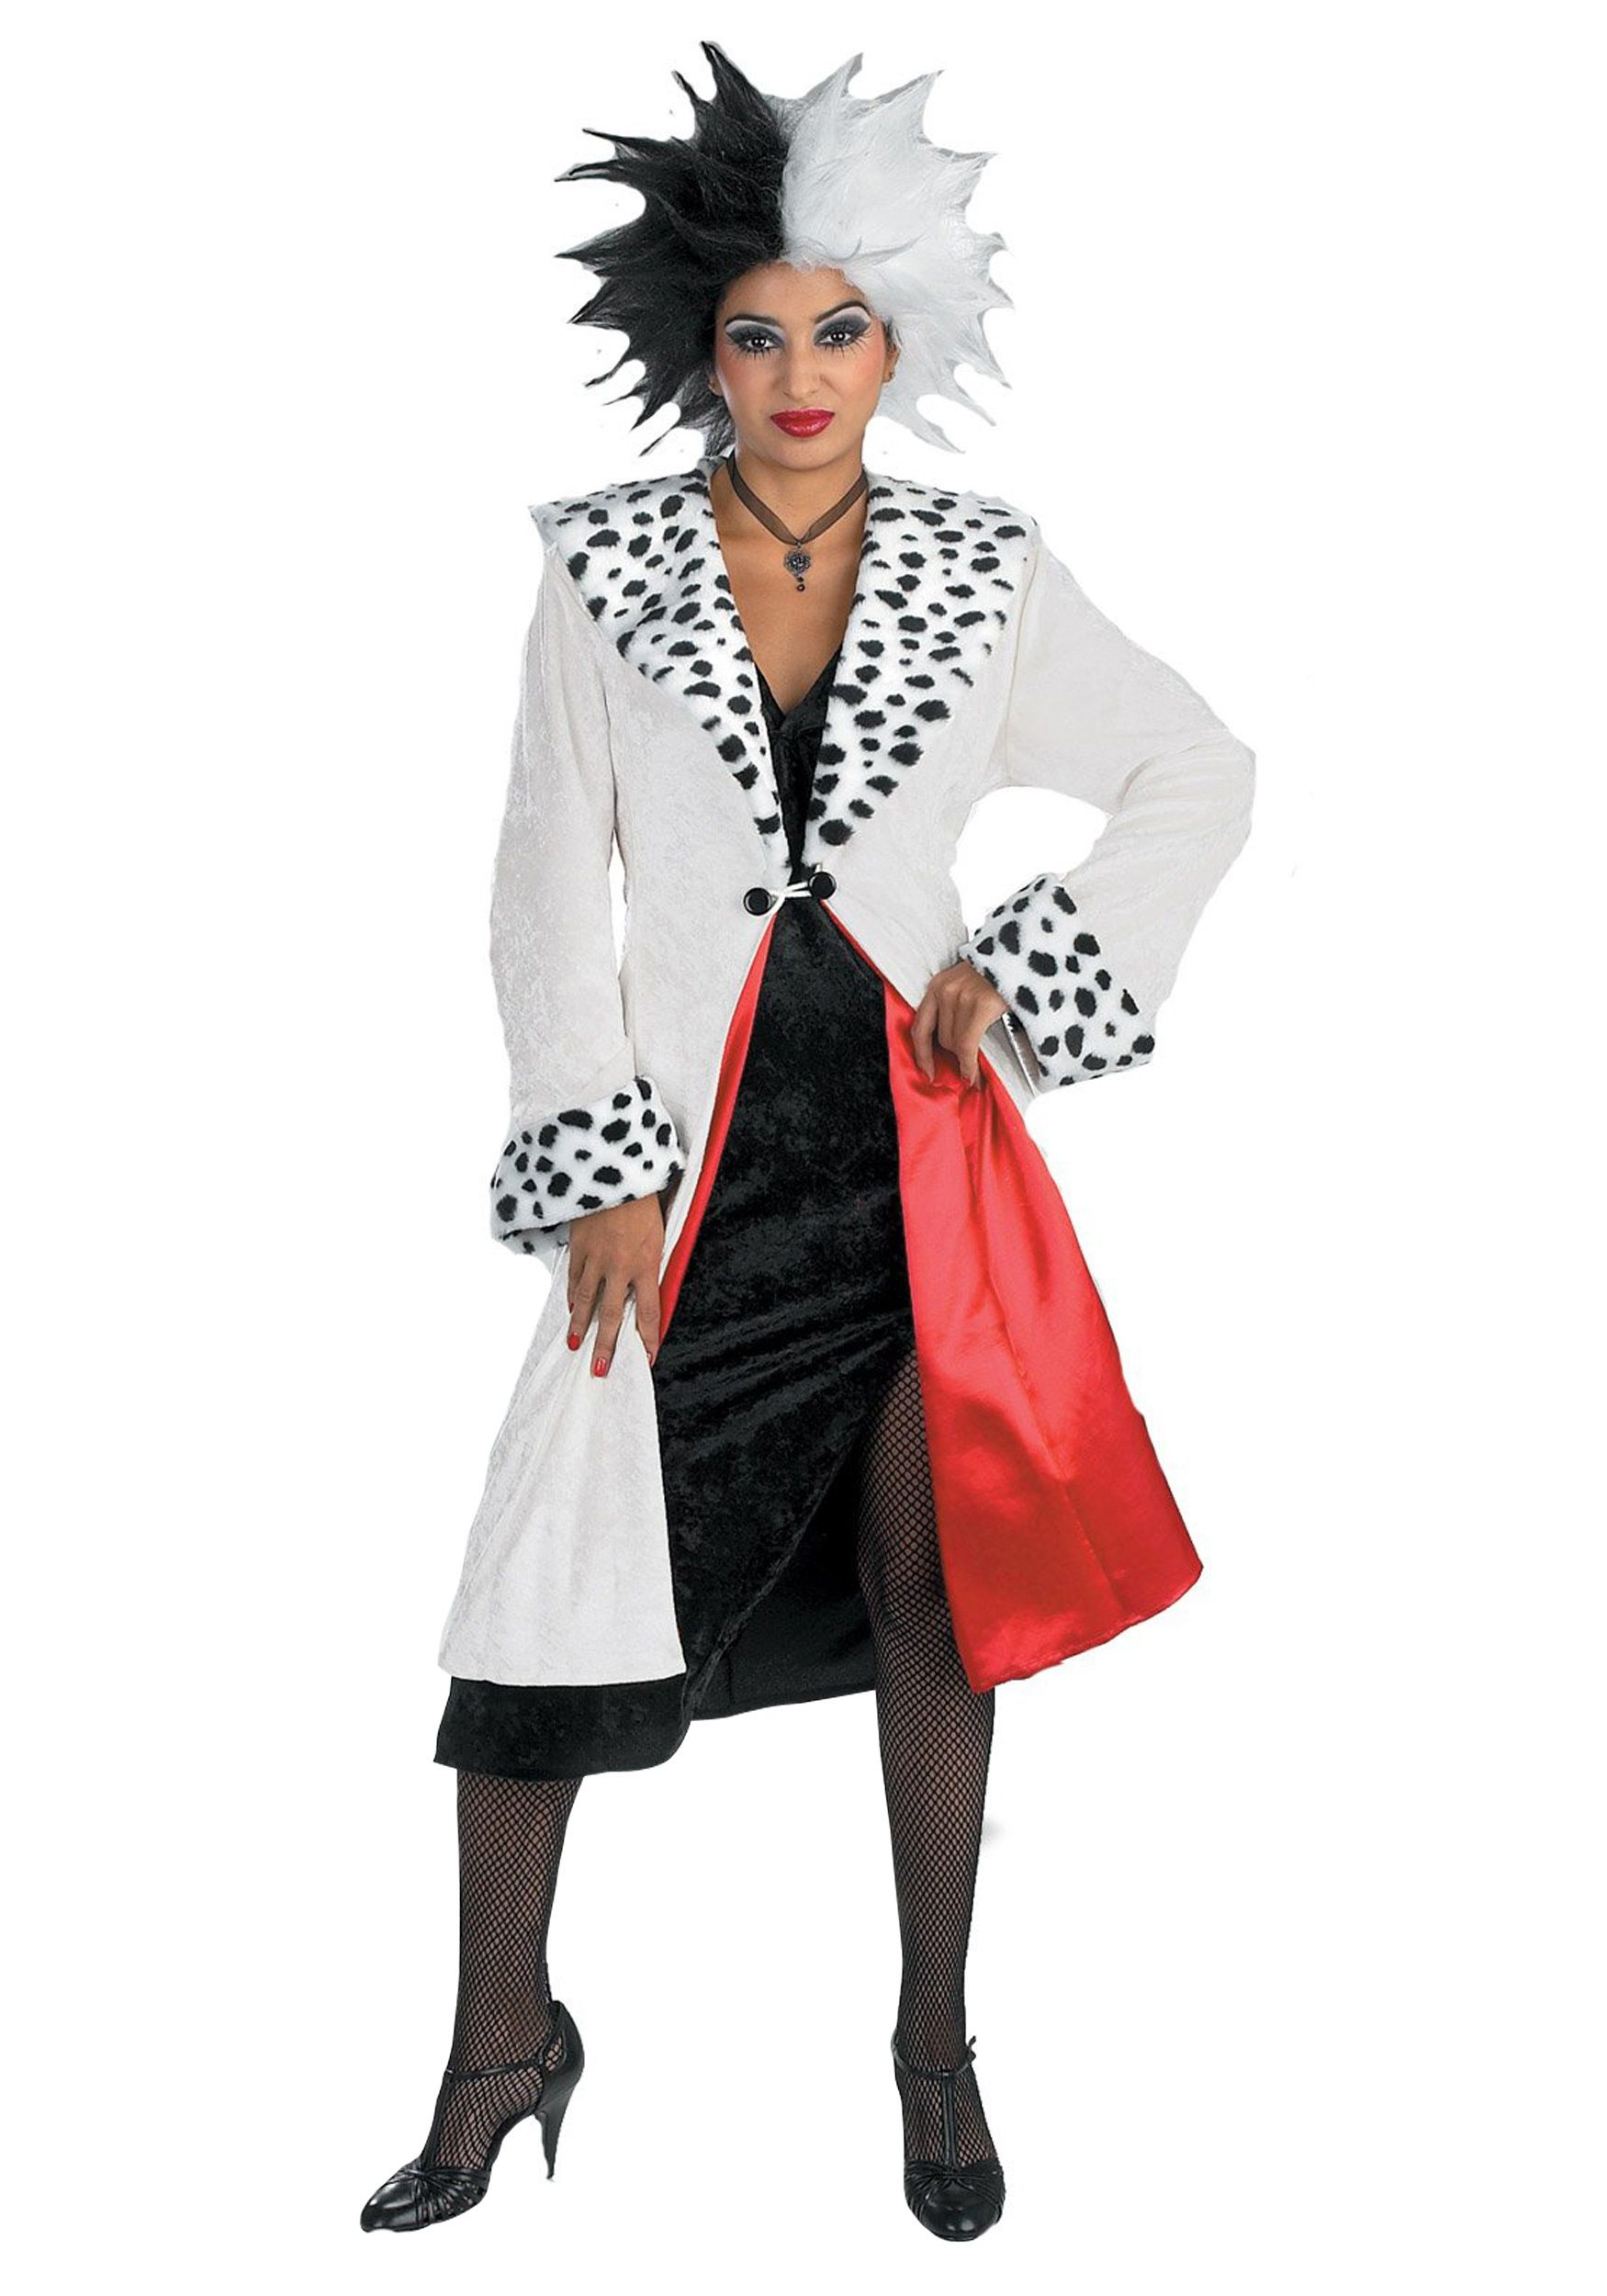 This cruella de vil adult costume includes a soft velvety black b5024512f2c395139b2c222565dc4690g solutioingenieria Images